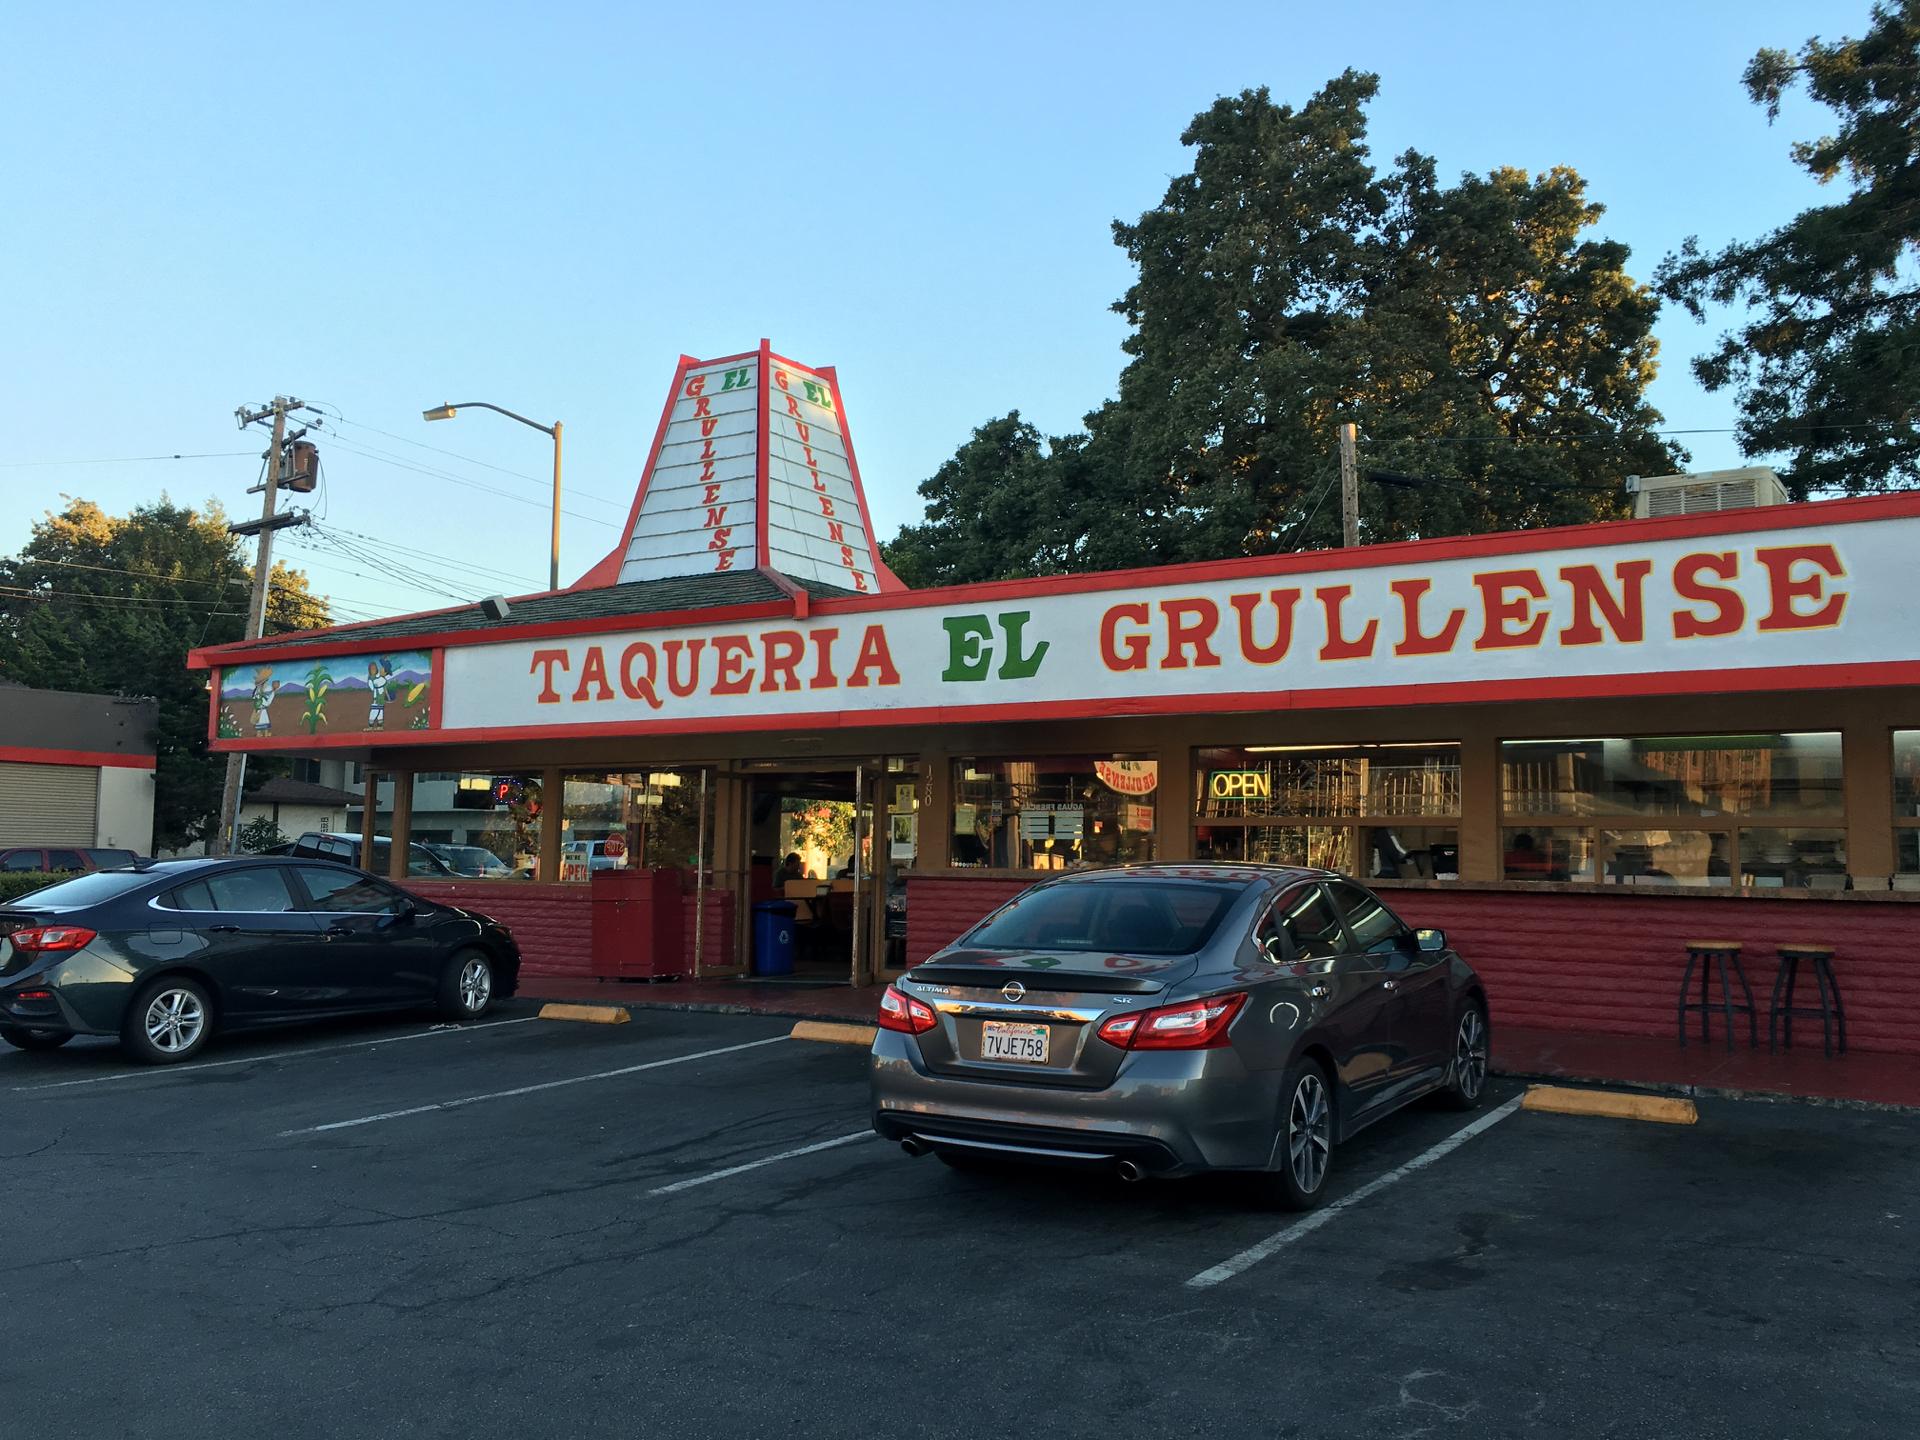 Outside Taqueria El Grullense in Redwood City.